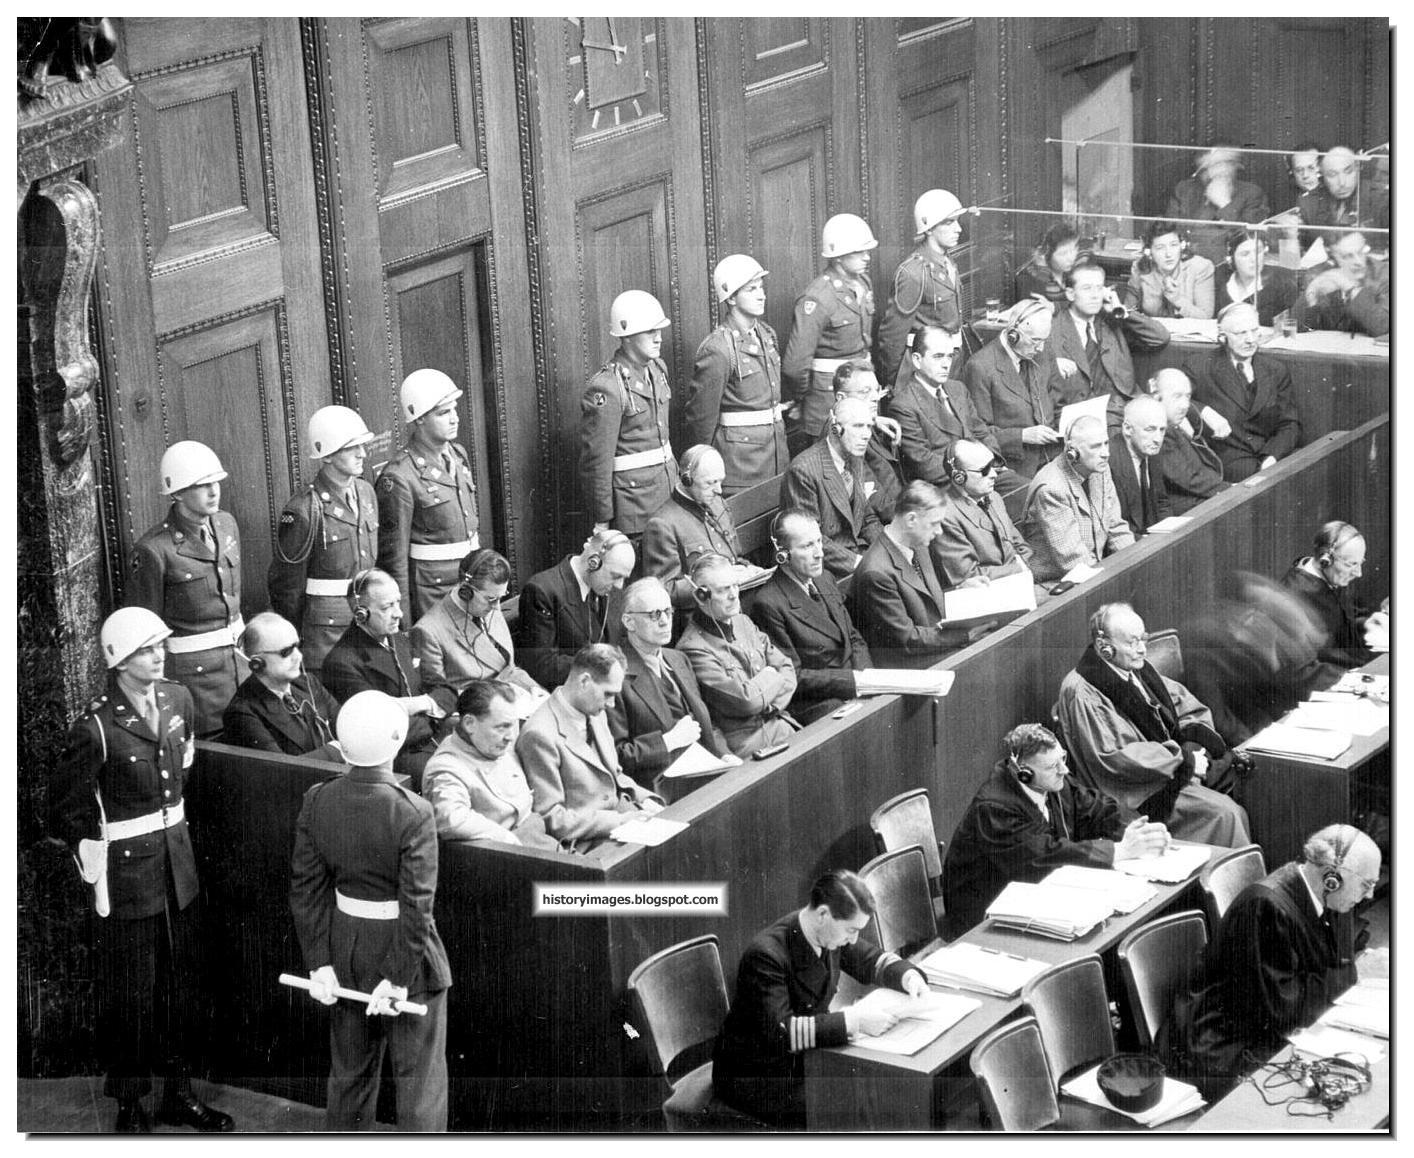 Nuremberg The Nazi Trials The Nazis Strike Details